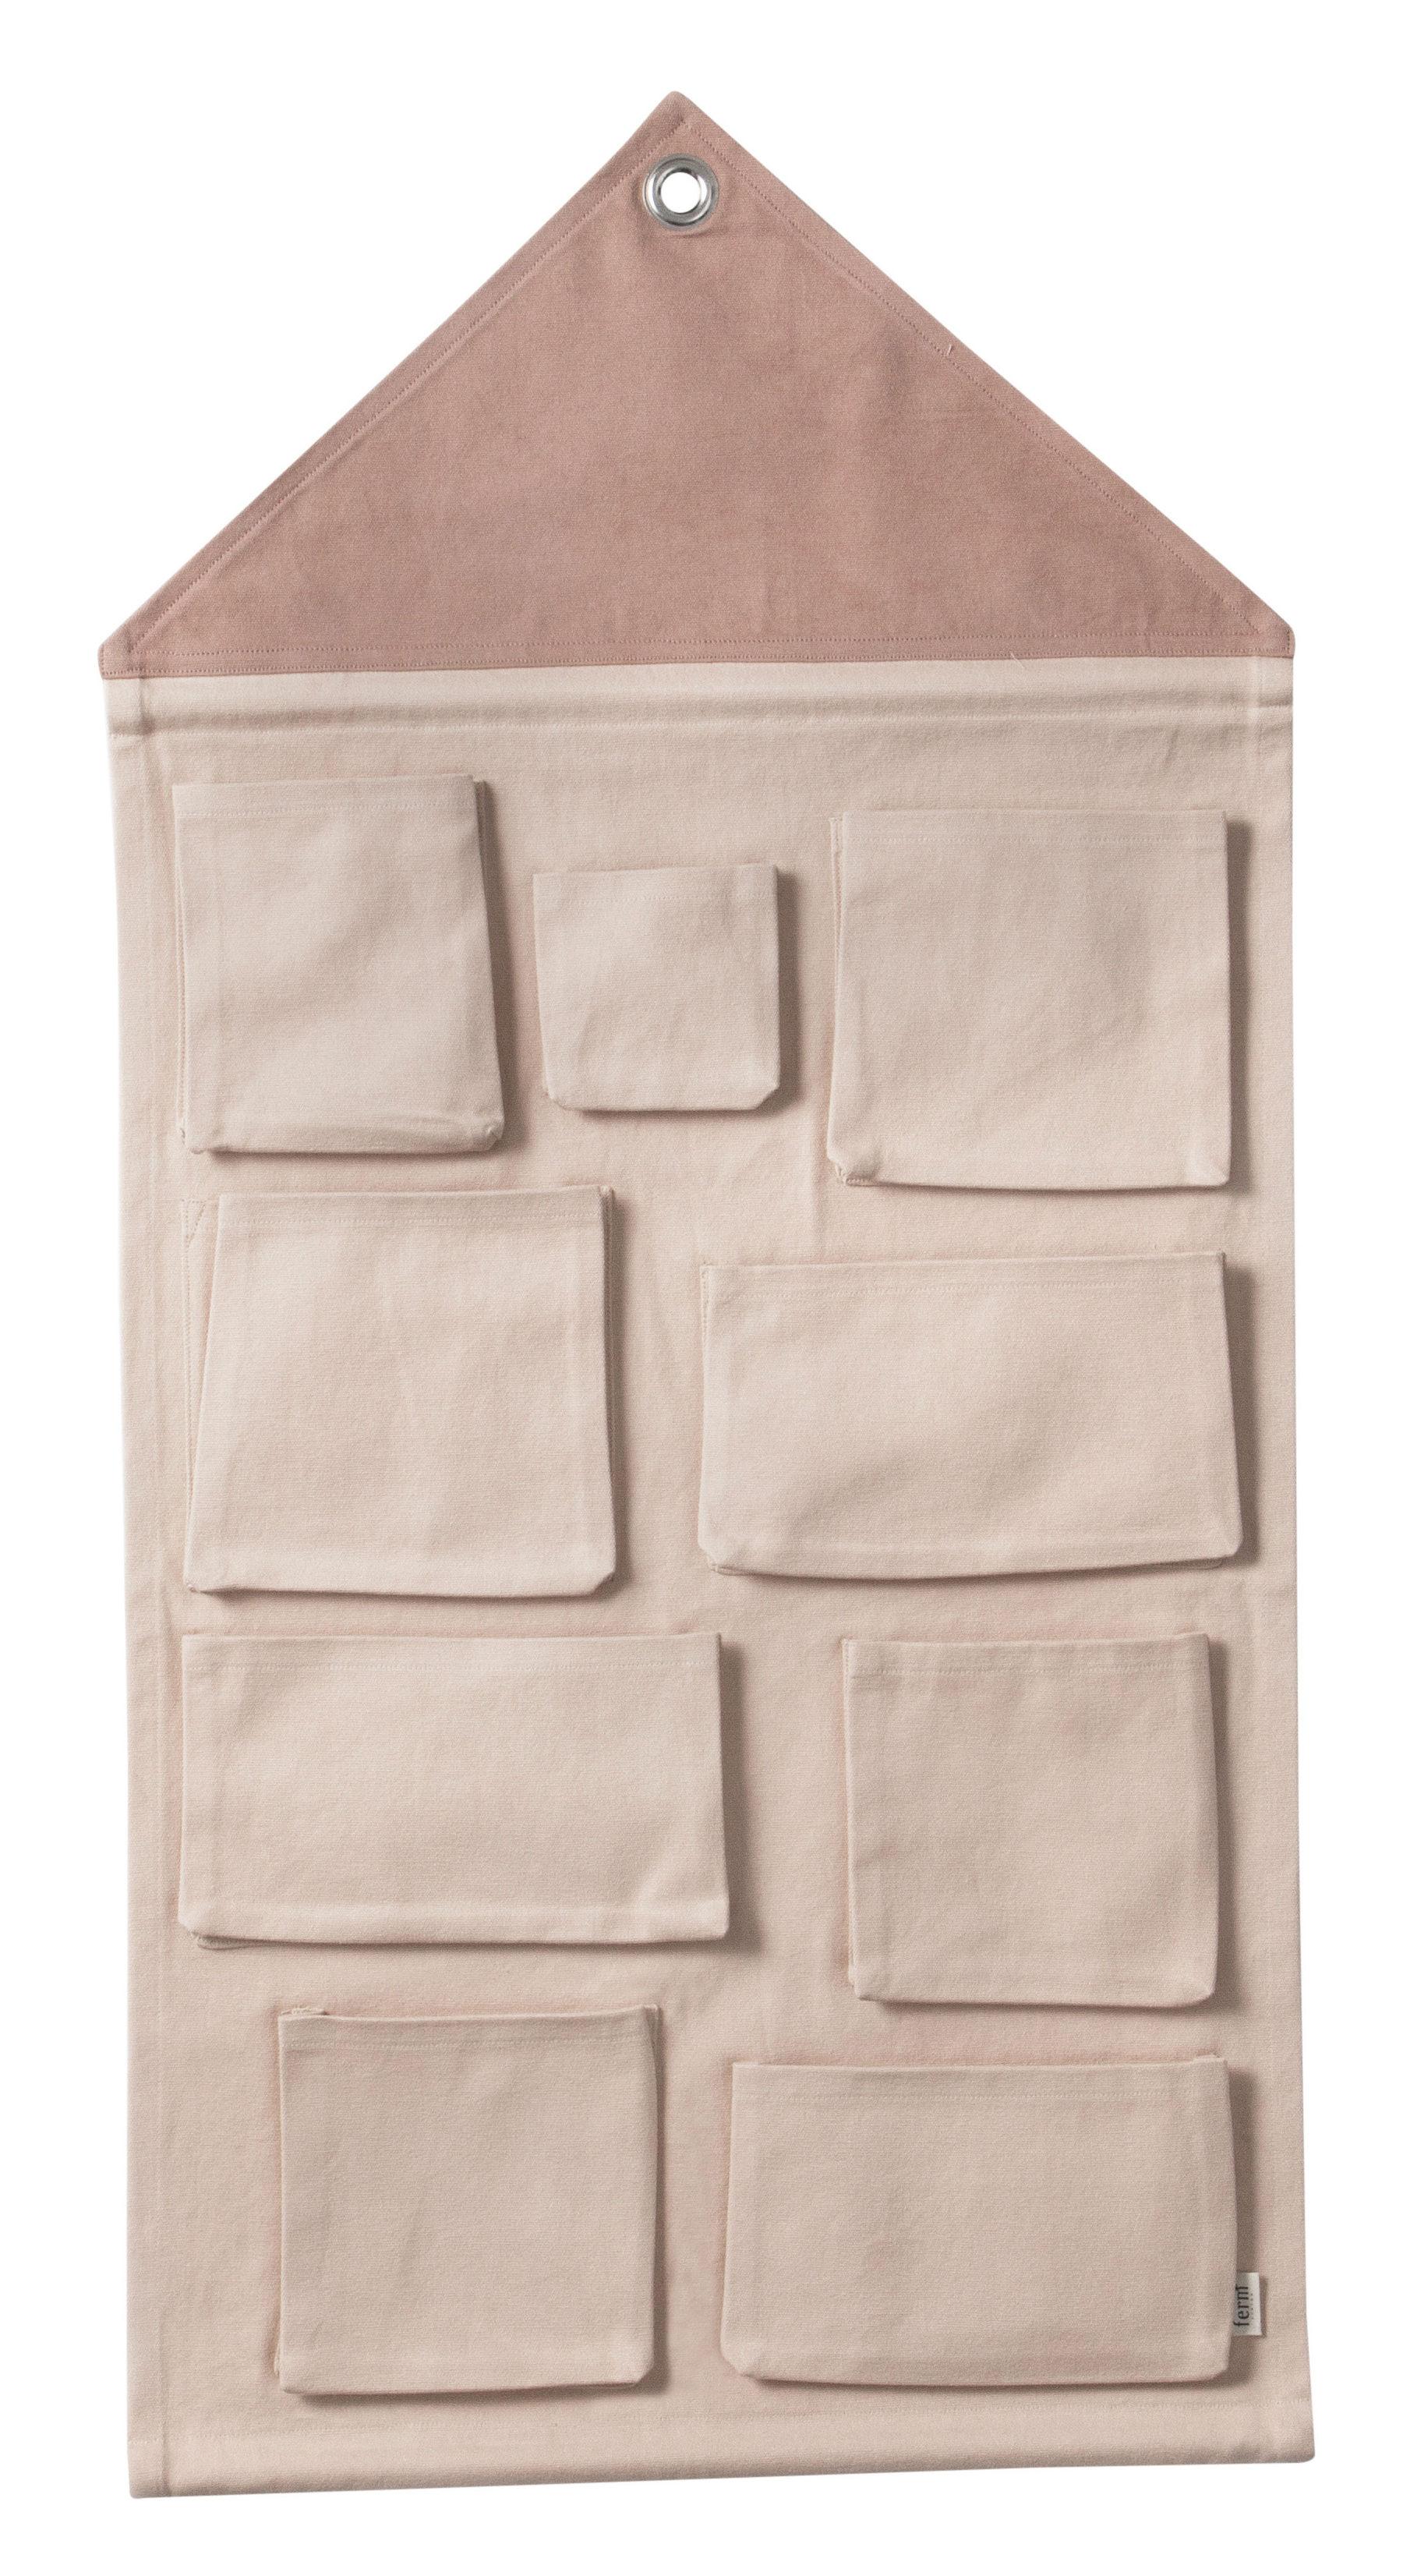 rangement mural house tissu l 80 x h 98 cm rose ferm. Black Bedroom Furniture Sets. Home Design Ideas